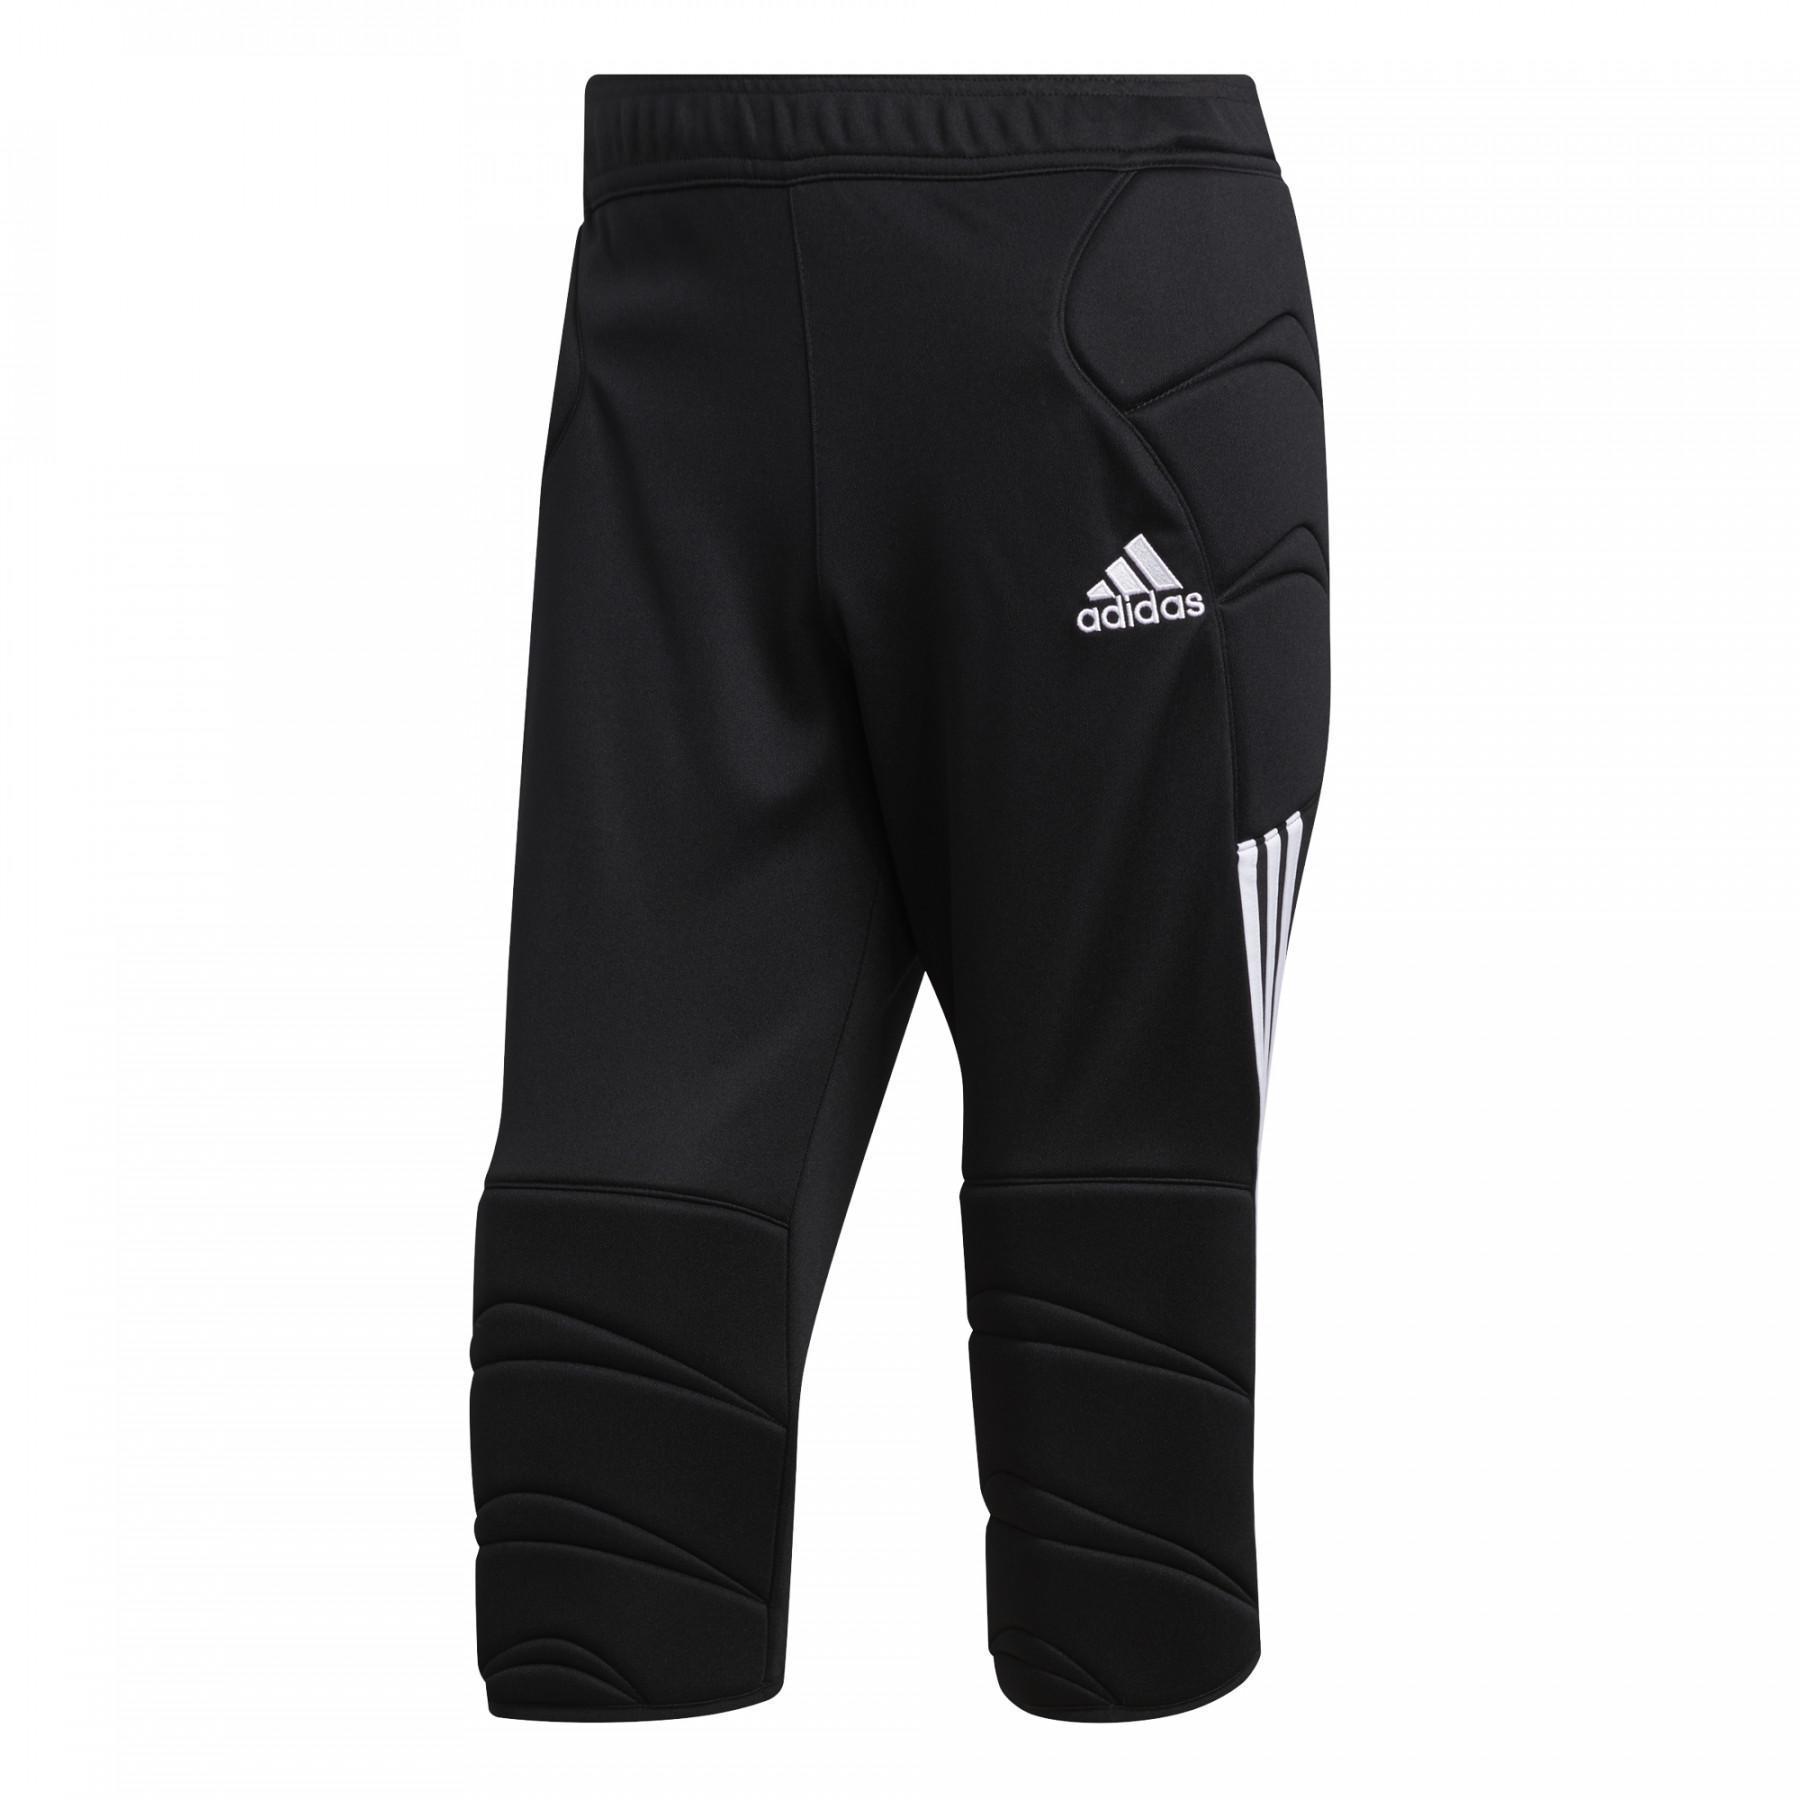 3/4 goalie pants adidas Tierro